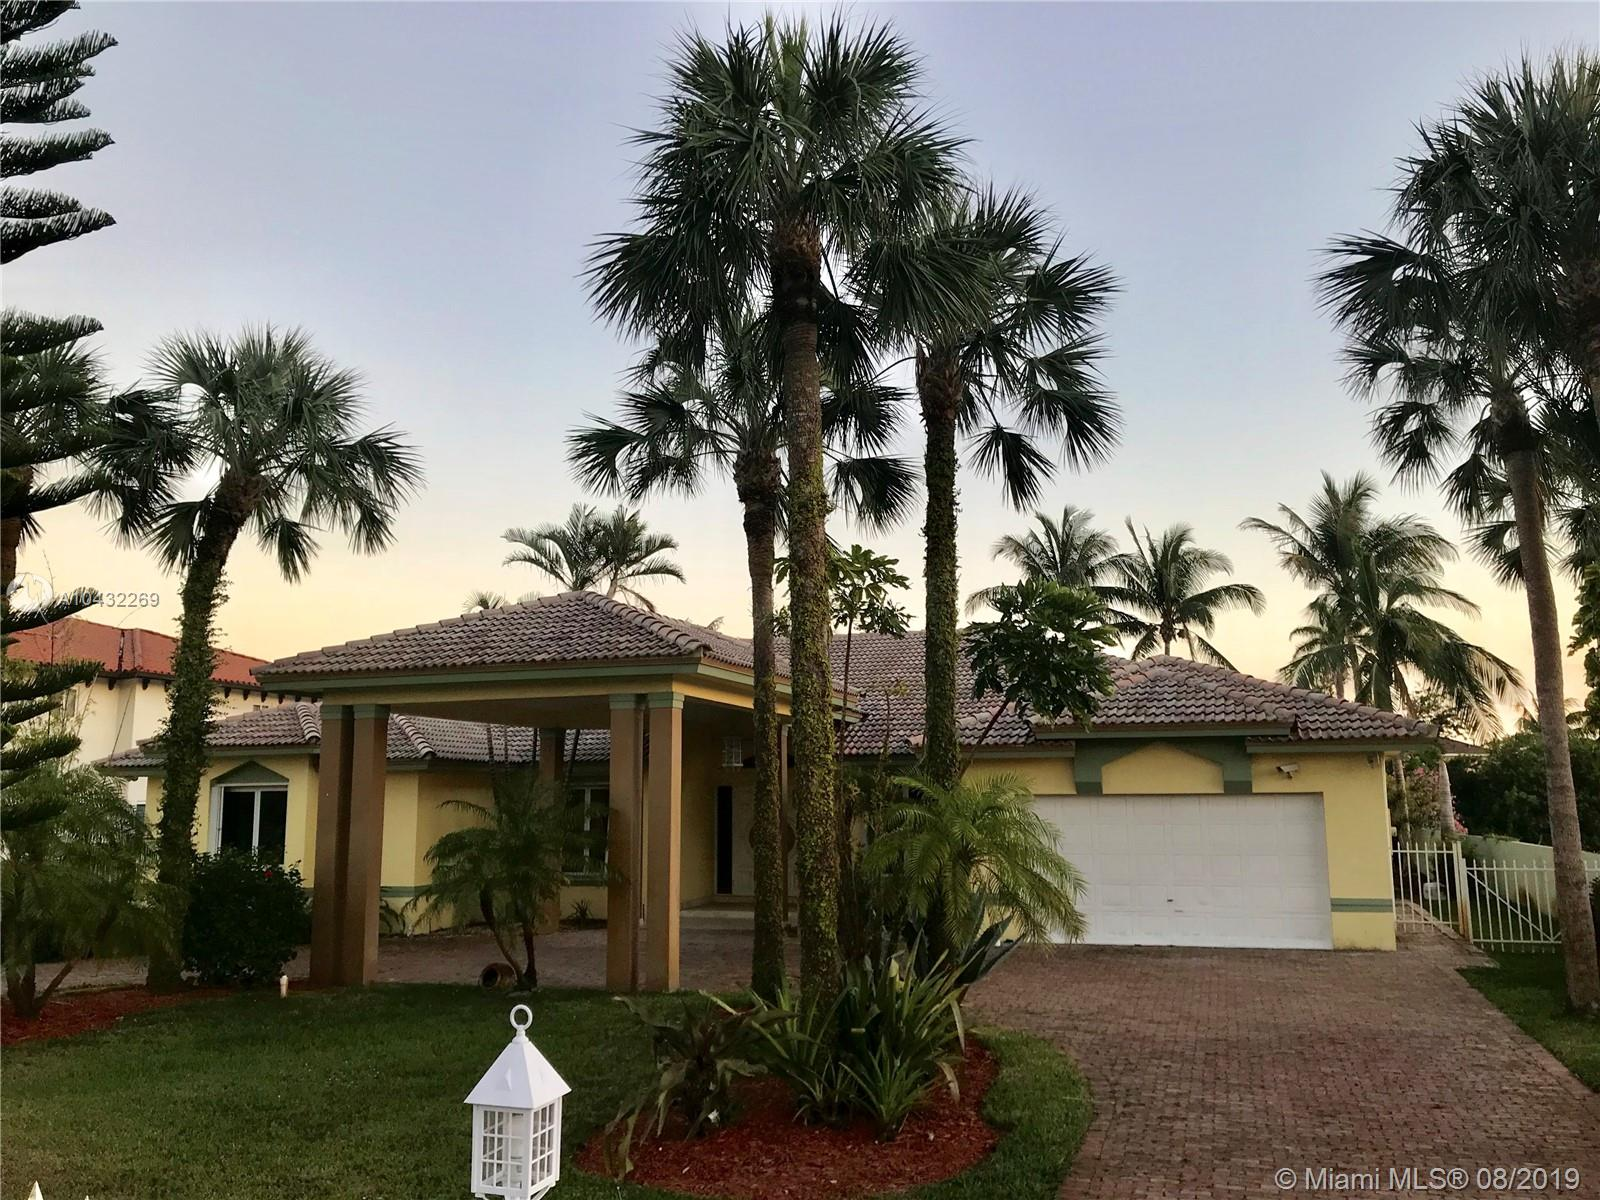 J G Heads Farms - 13810 SW 34th St, Miami, FL 33175